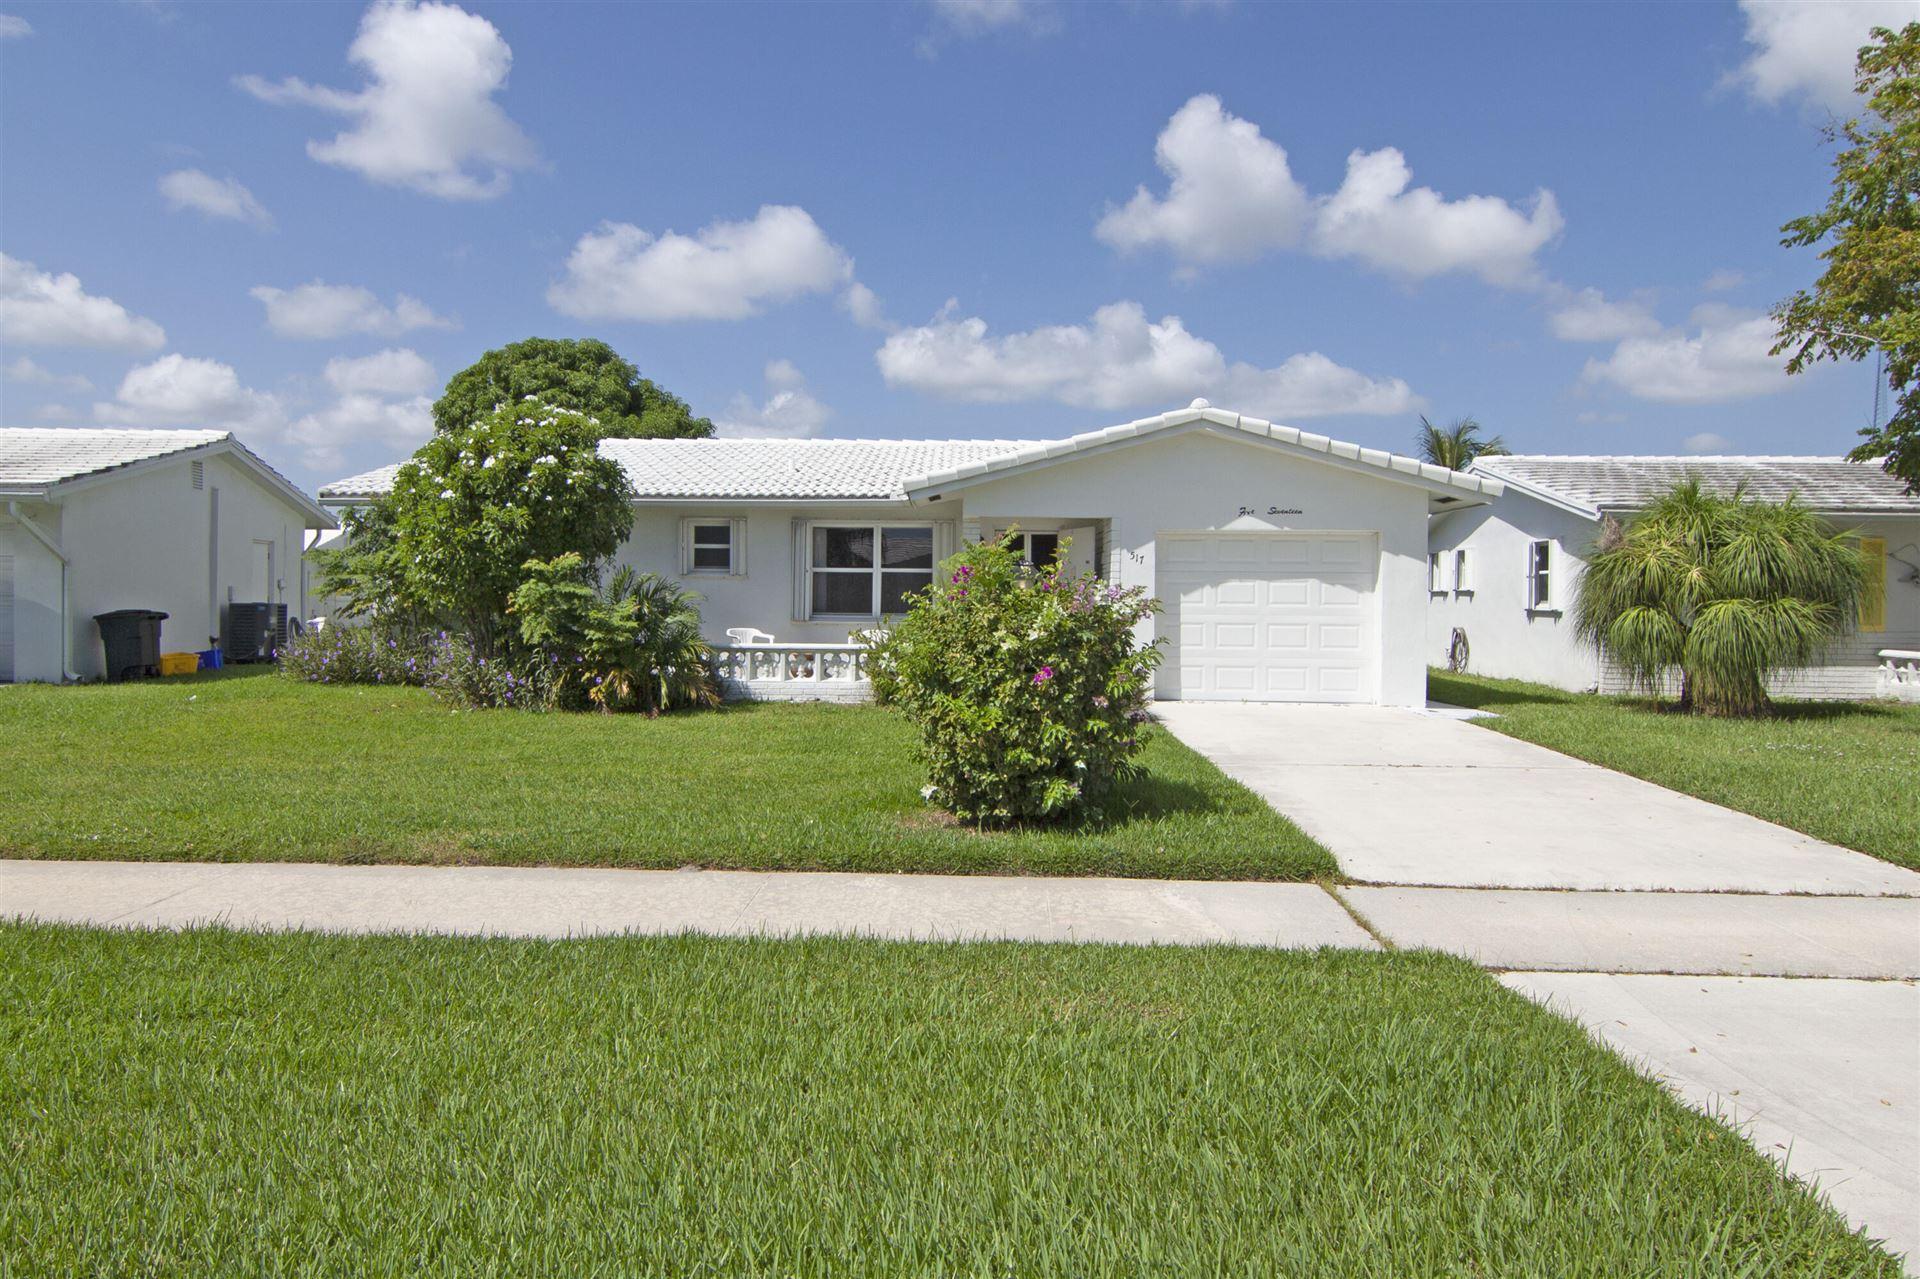 517 SW 18 Street, Boynton Beach, FL 33426 - MLS#: RX-10745425